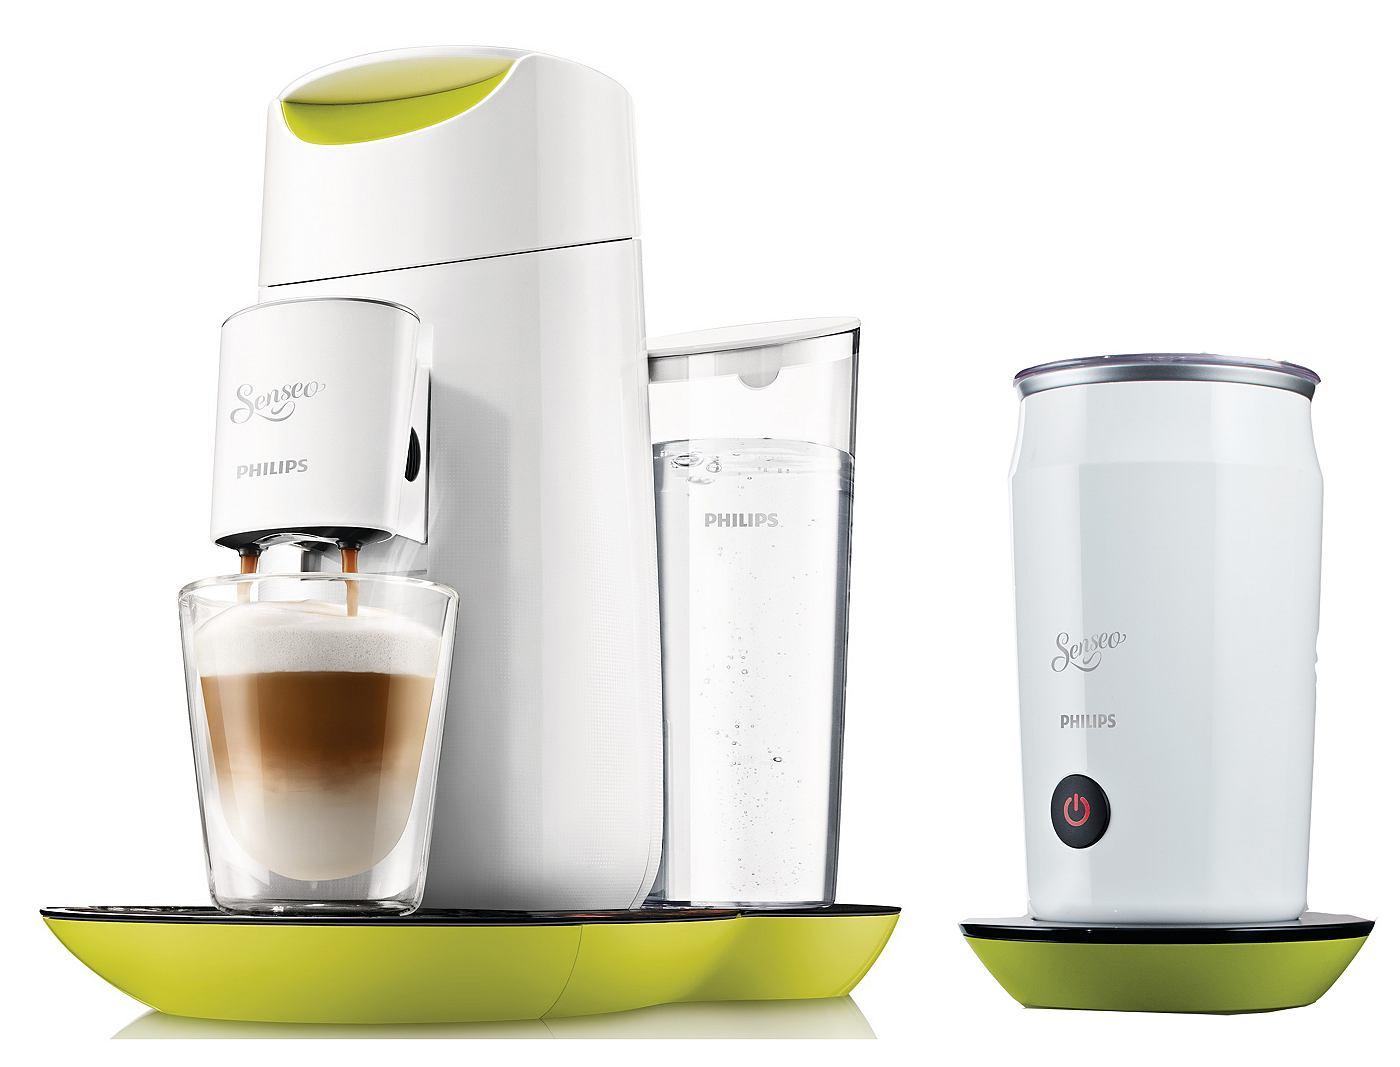 philips senseo system f r kaffeepads senseo hd7874 60 twist milk. Black Bedroom Furniture Sets. Home Design Ideas